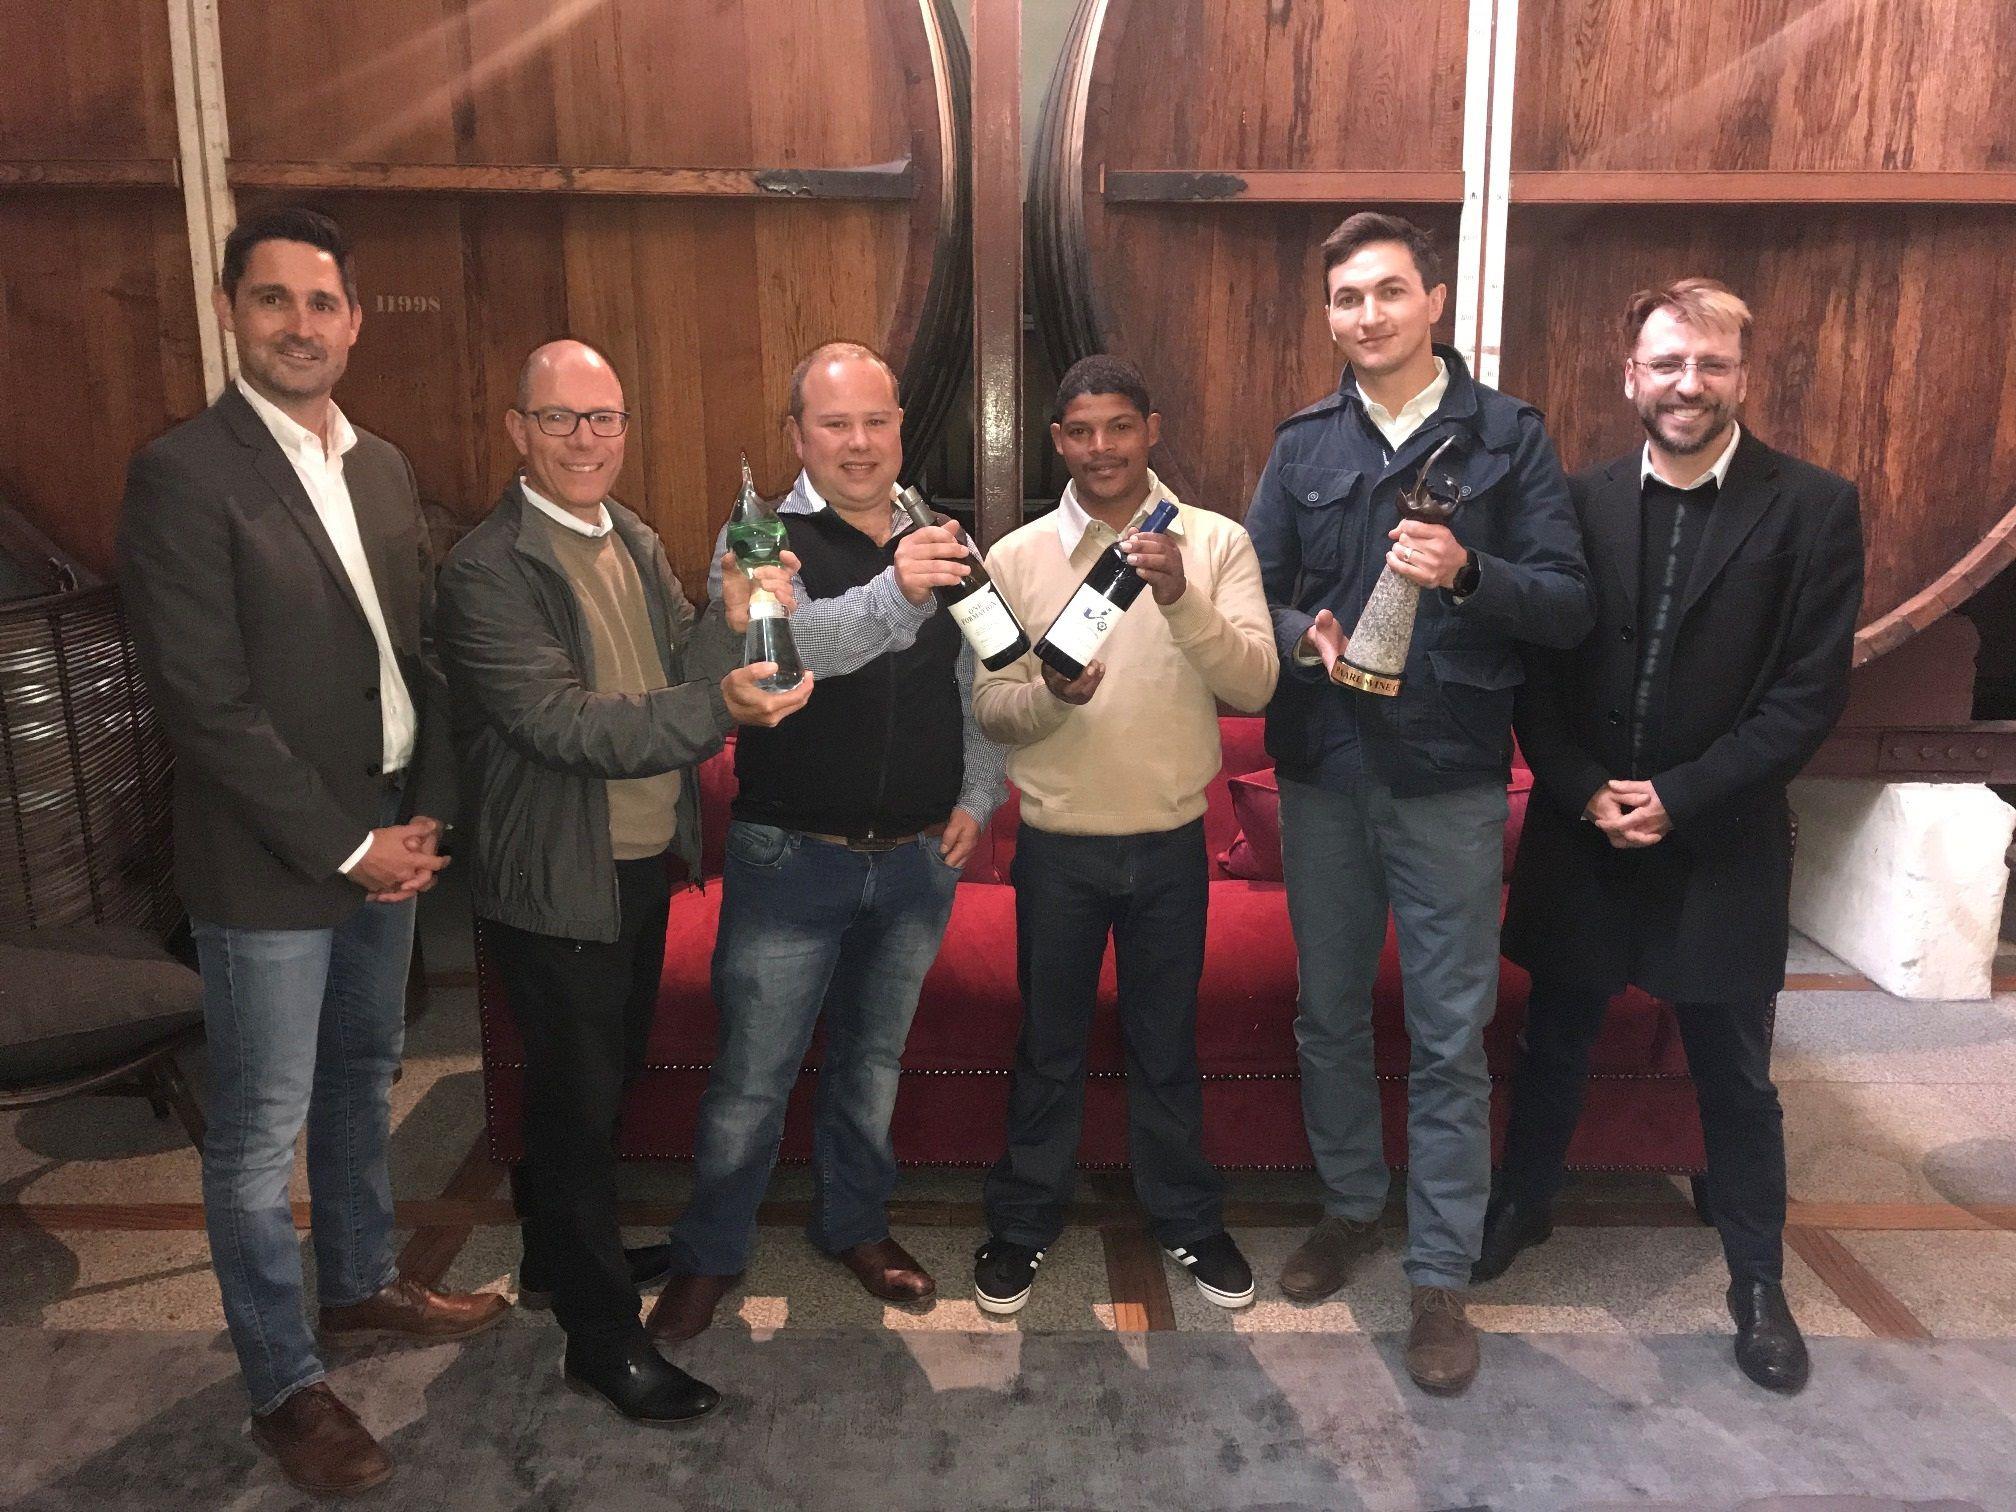 Babylonstoren, Boland Cellar Awarded Top Spot At Paarl Wine Challenge 2018 photo